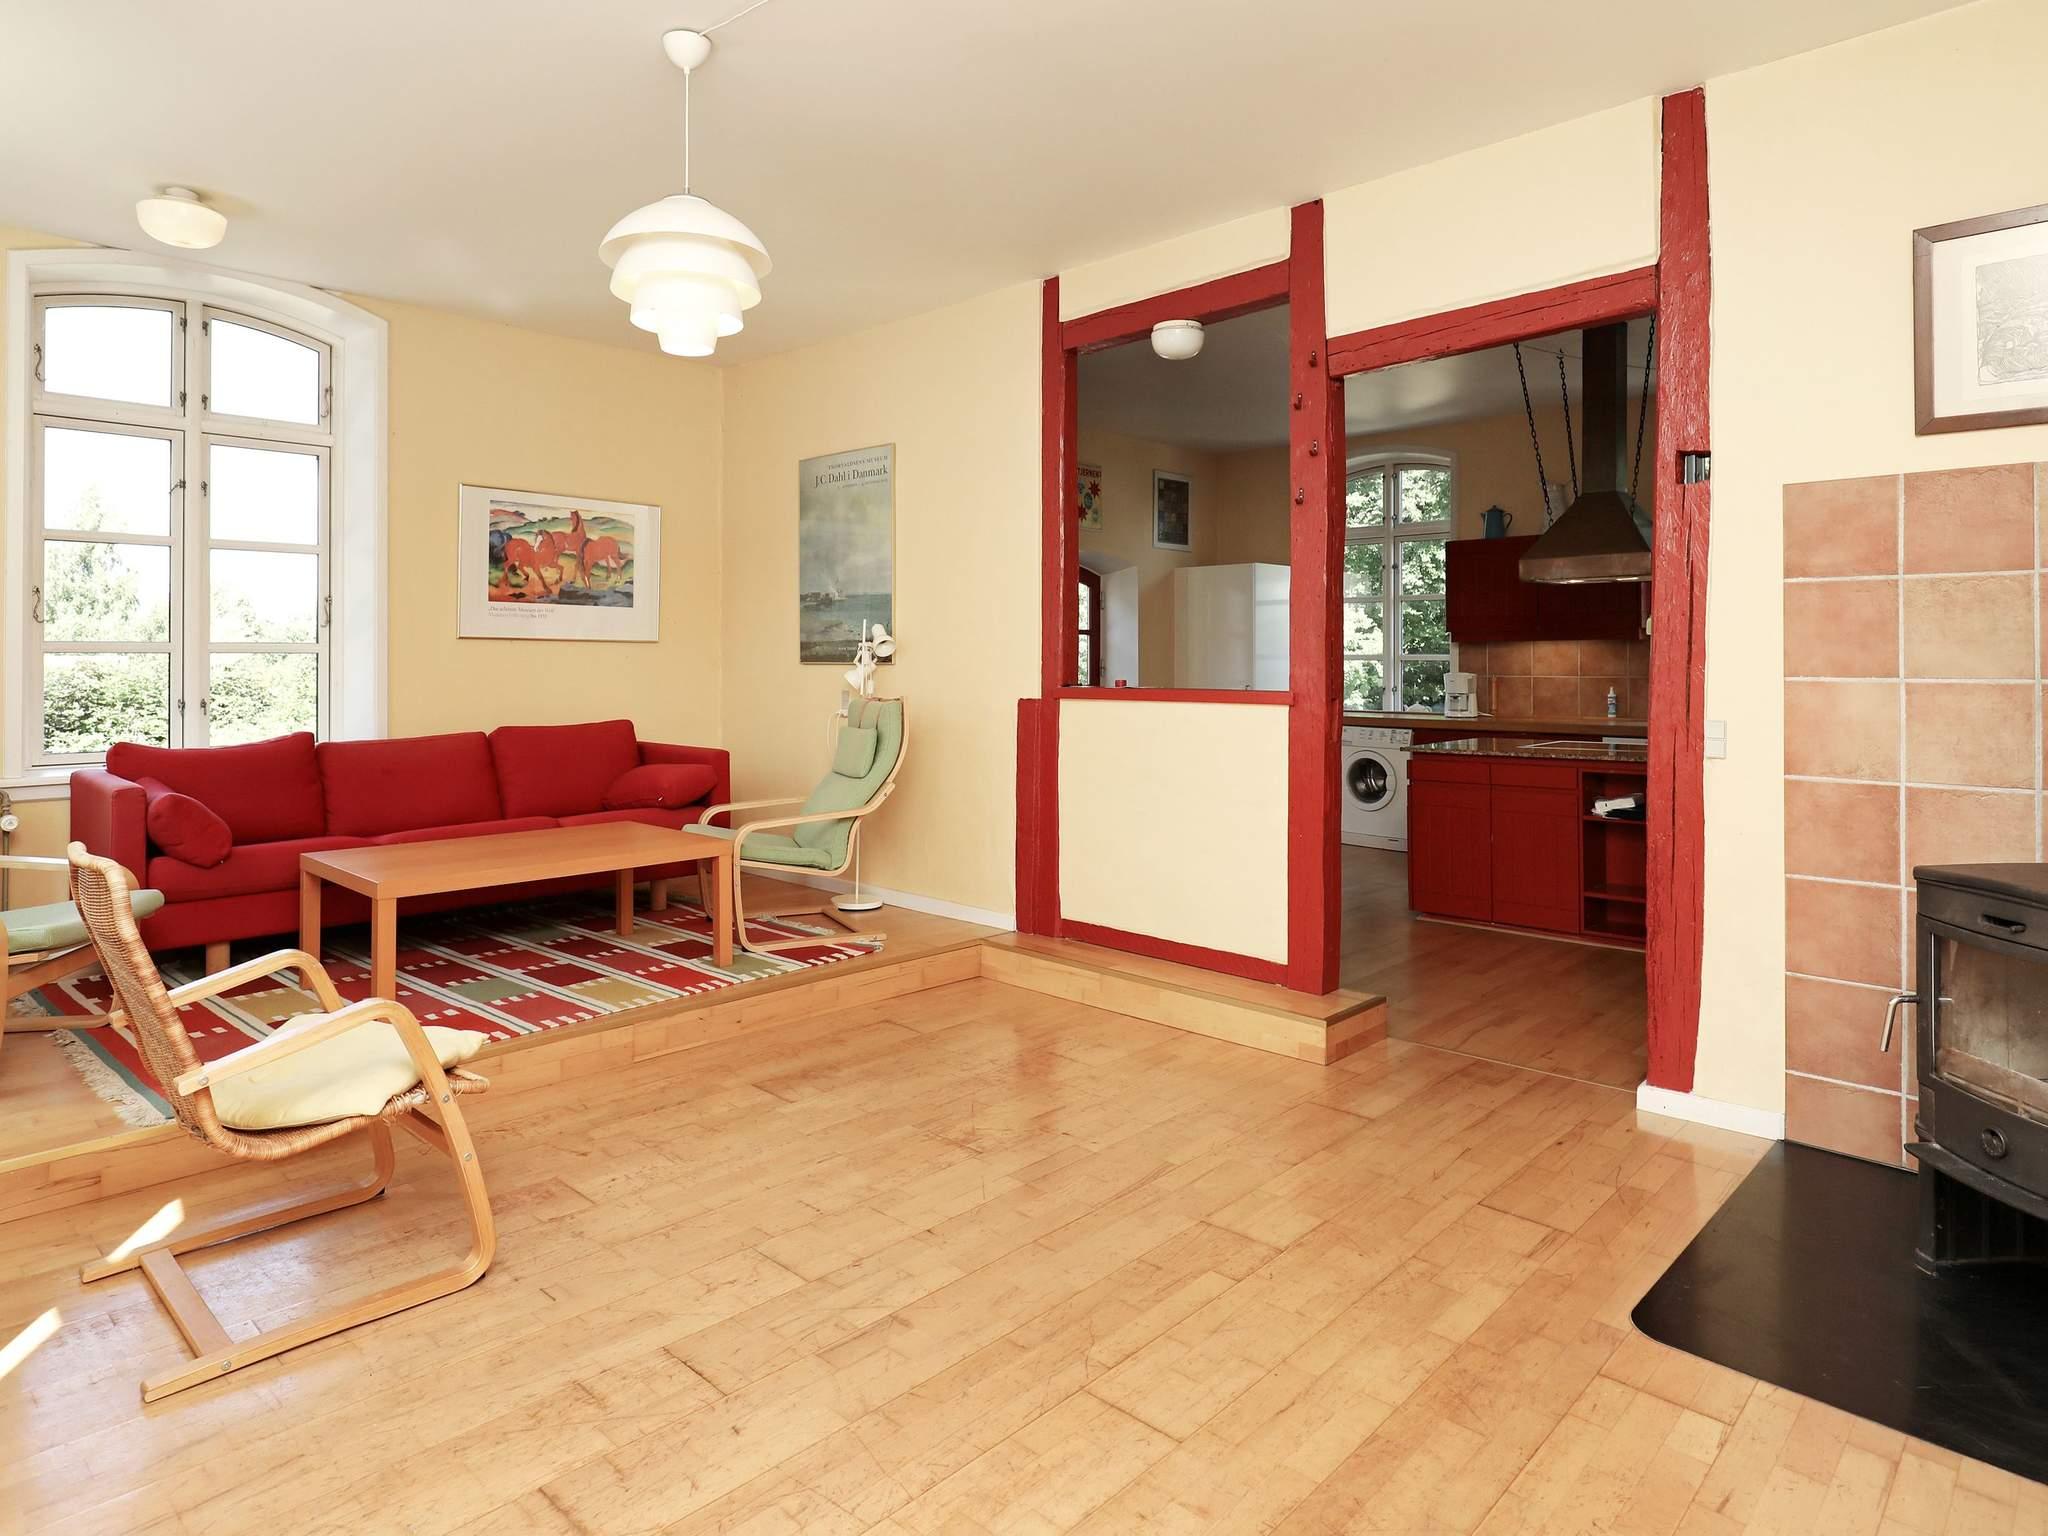 Ferienhaus Bukkemose (2453155), Humble, , Langeland, Dänemark, Bild 9